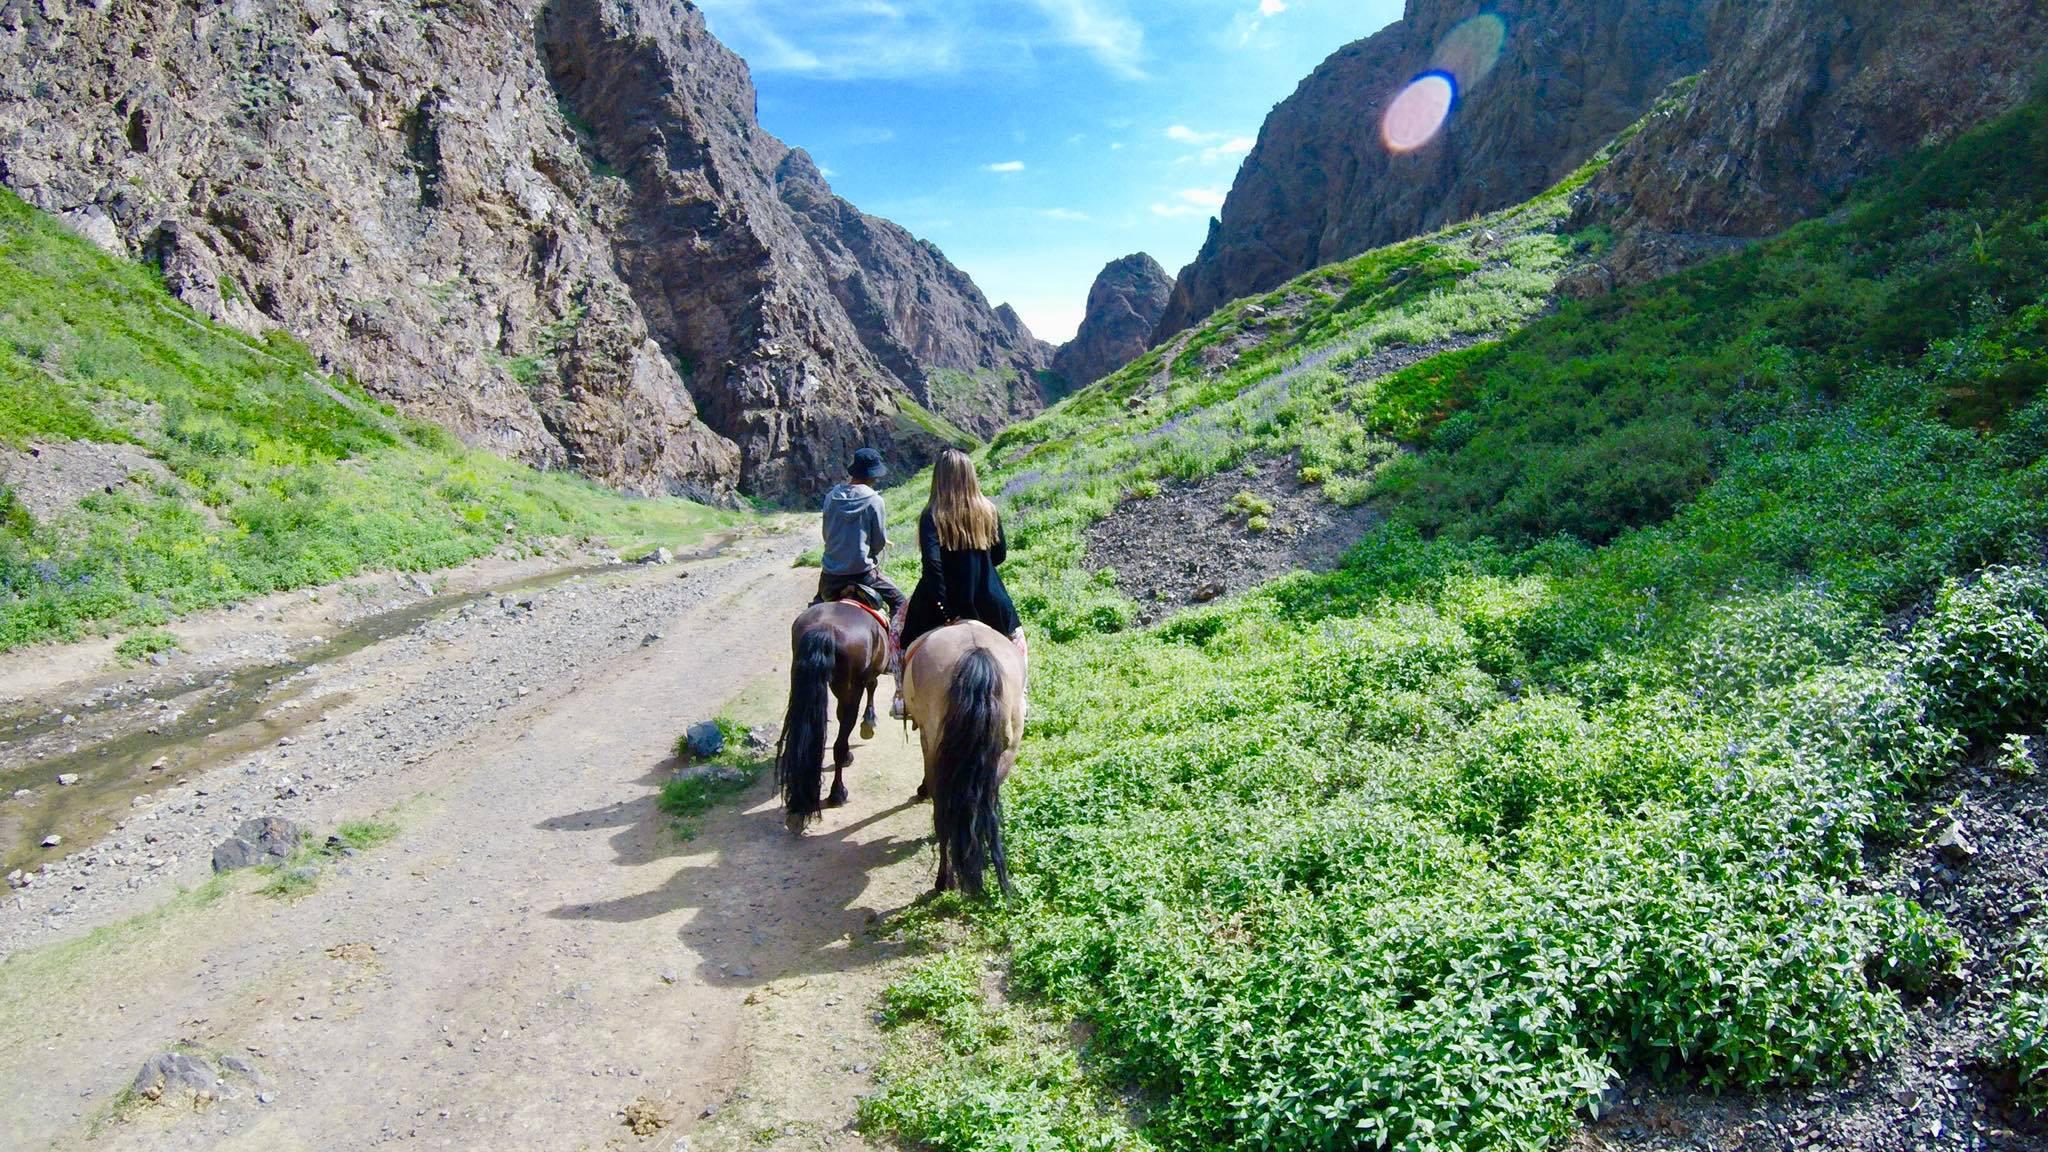 Kach Solo Travels in 2019 Horseback riding trip to the Gobi Gurvan Saikhan National Park6.jpg